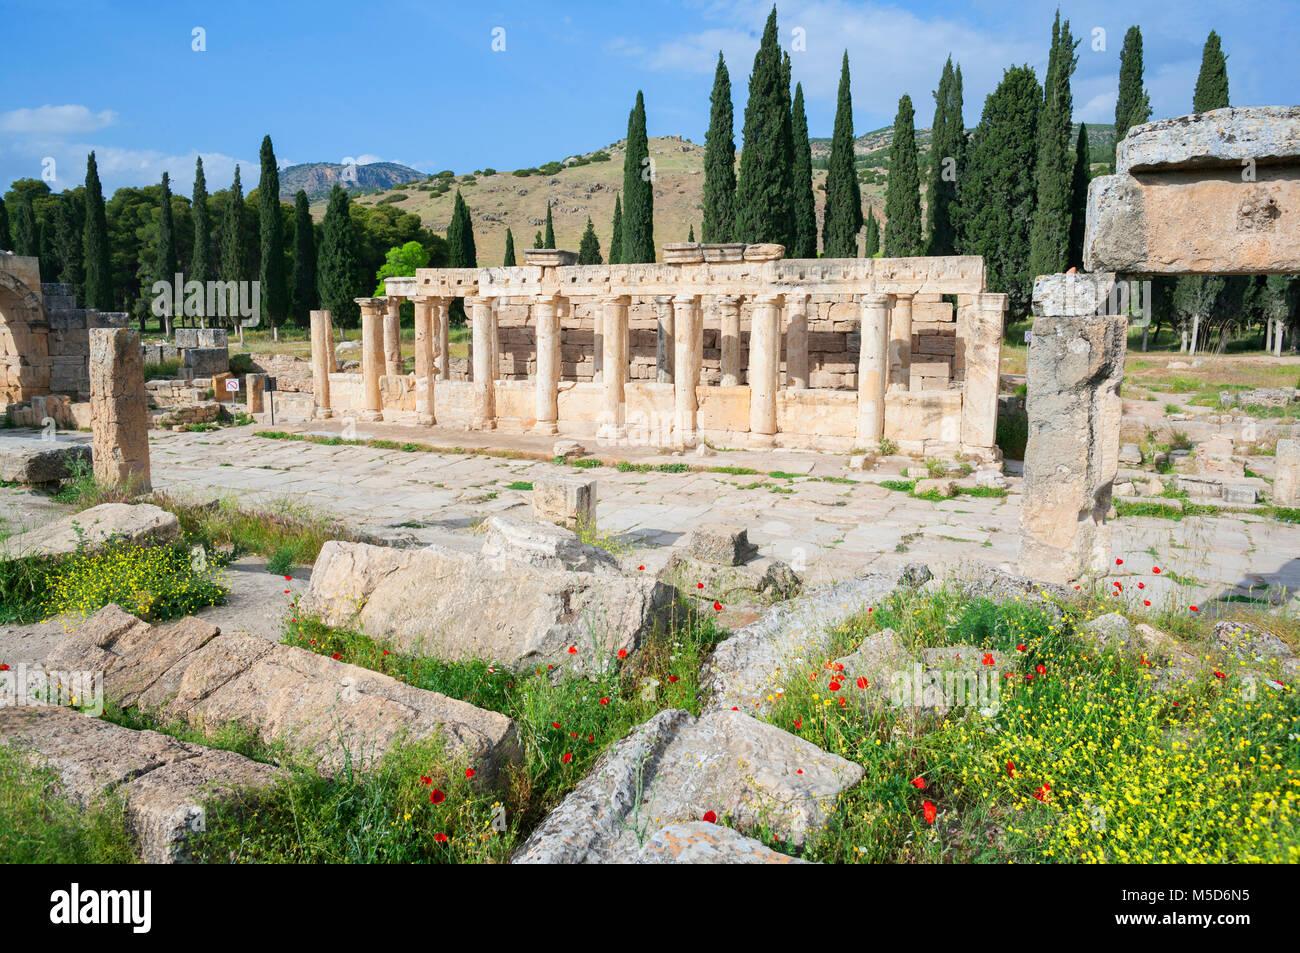 Ancient Roman necropolis ruins, Hierapolis, Pamukkale, Denizli, Anatolia, Turkey - Stock Image